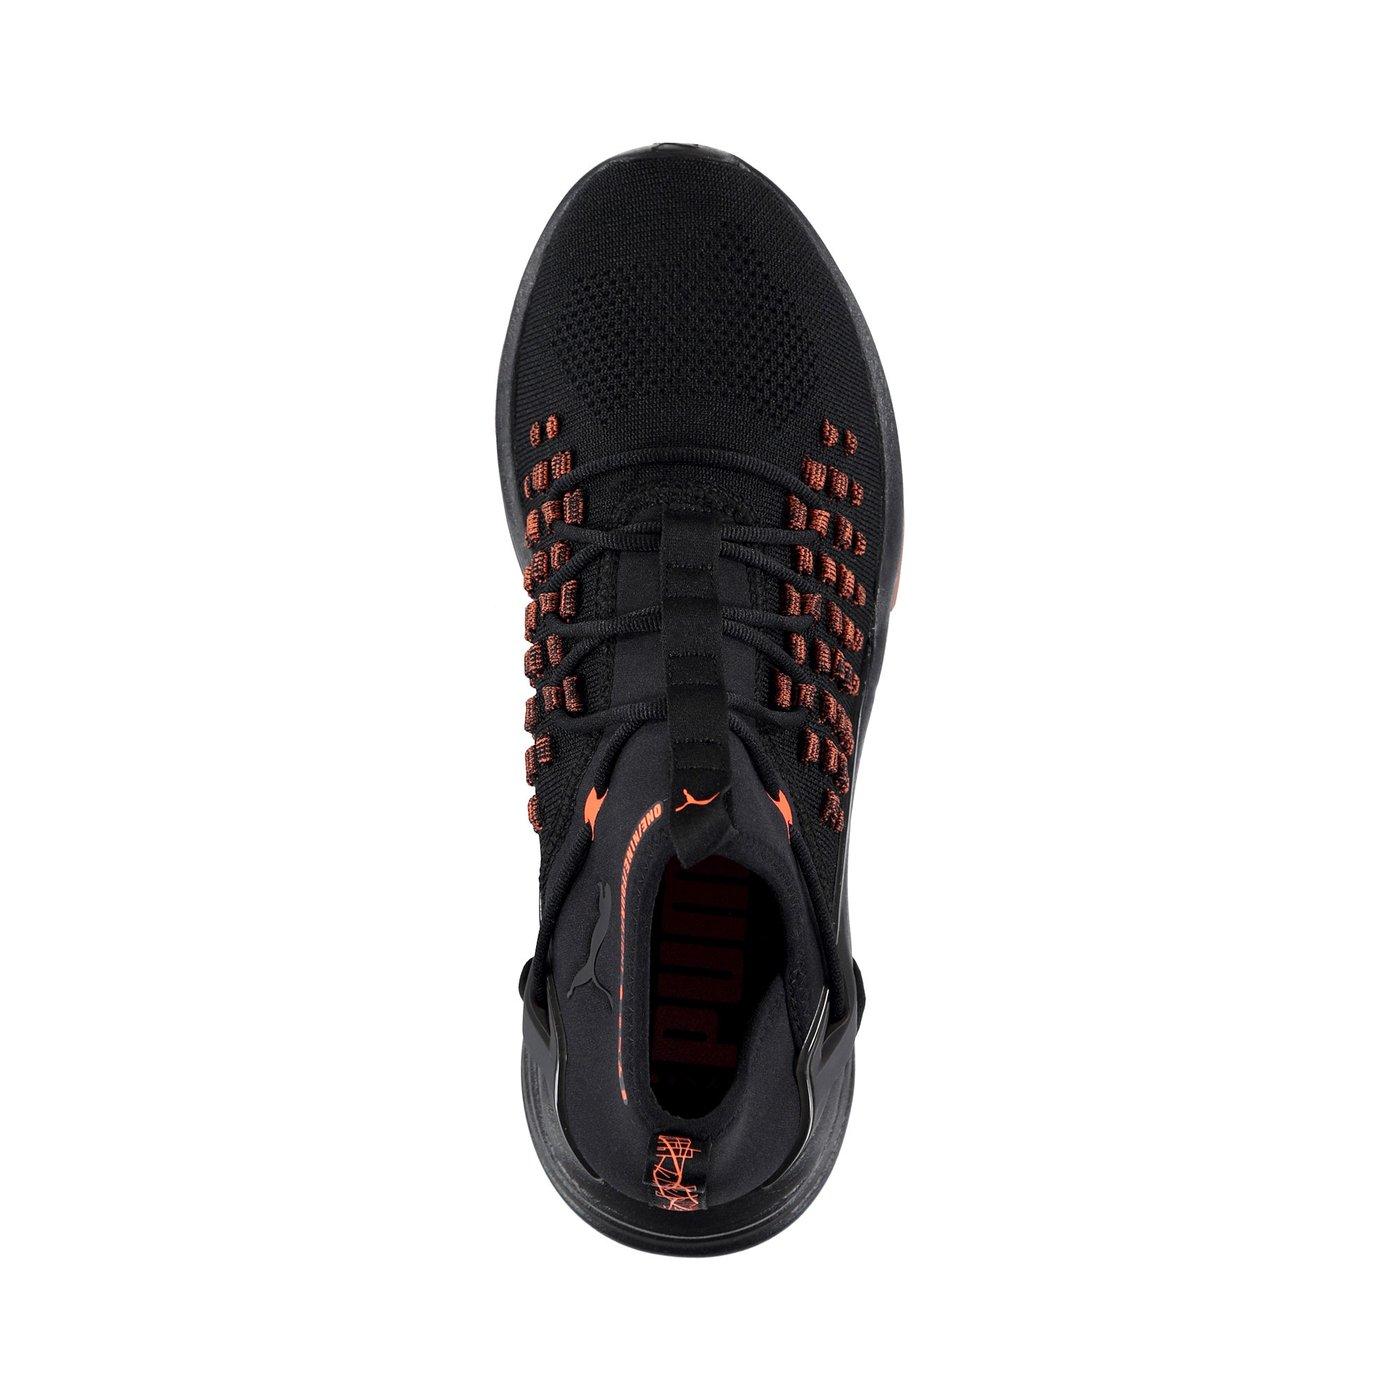 Puma Mantra Fusefit Erkek Siyah Spor Ayakkabı